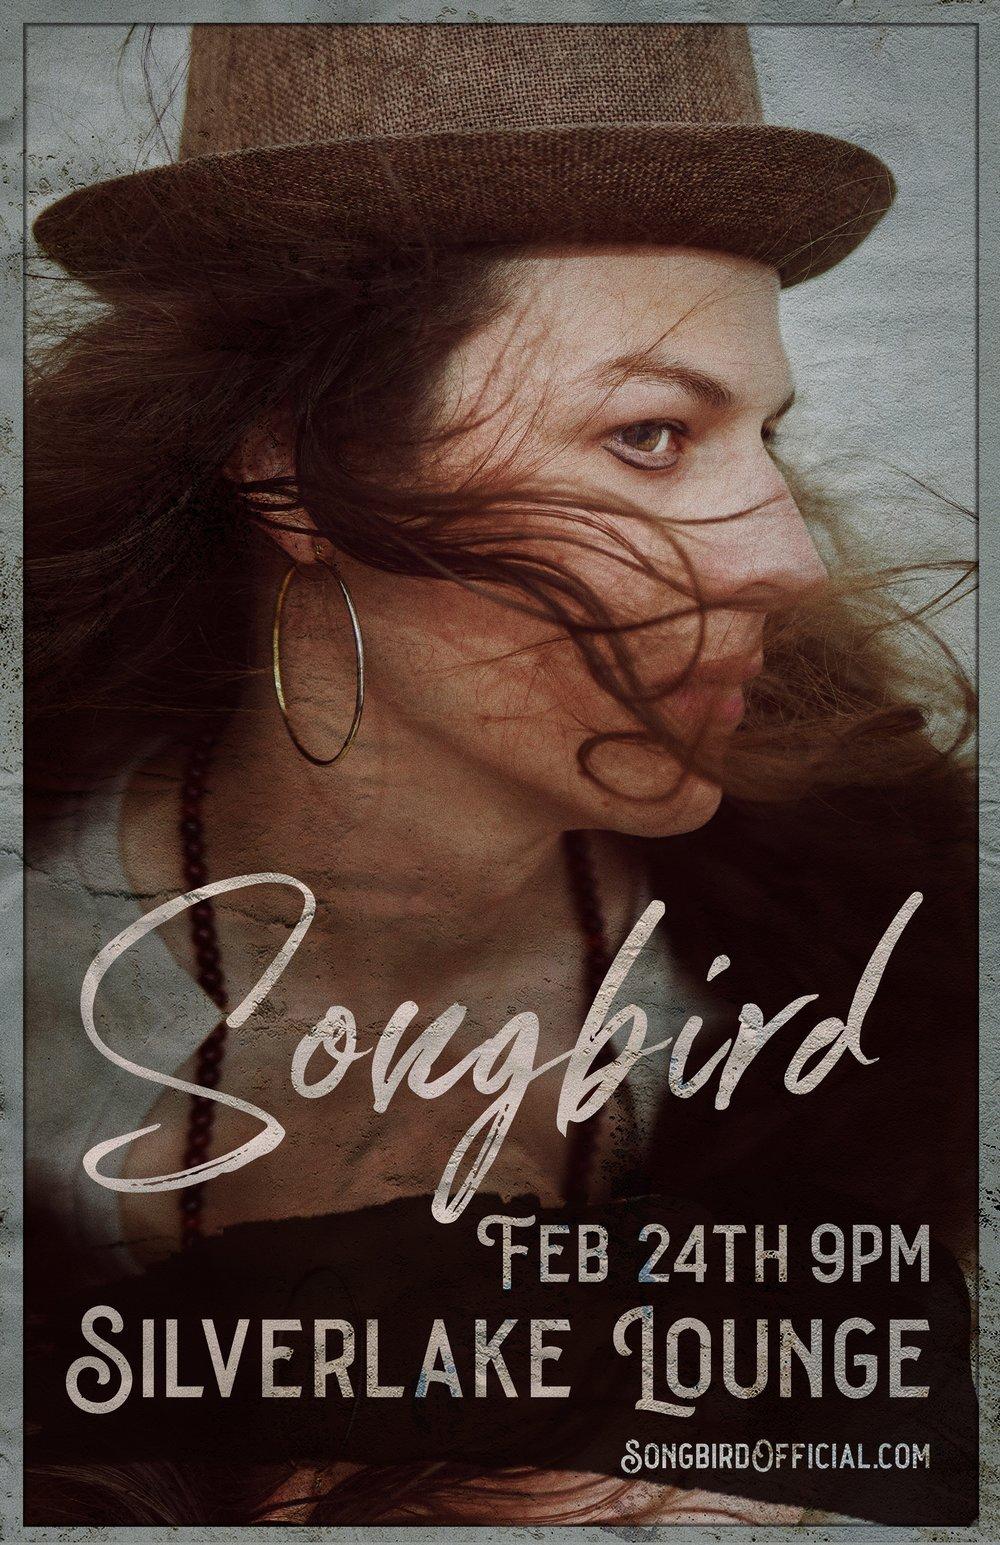 Songbird-Silverlake_Lounge-2019.JPG